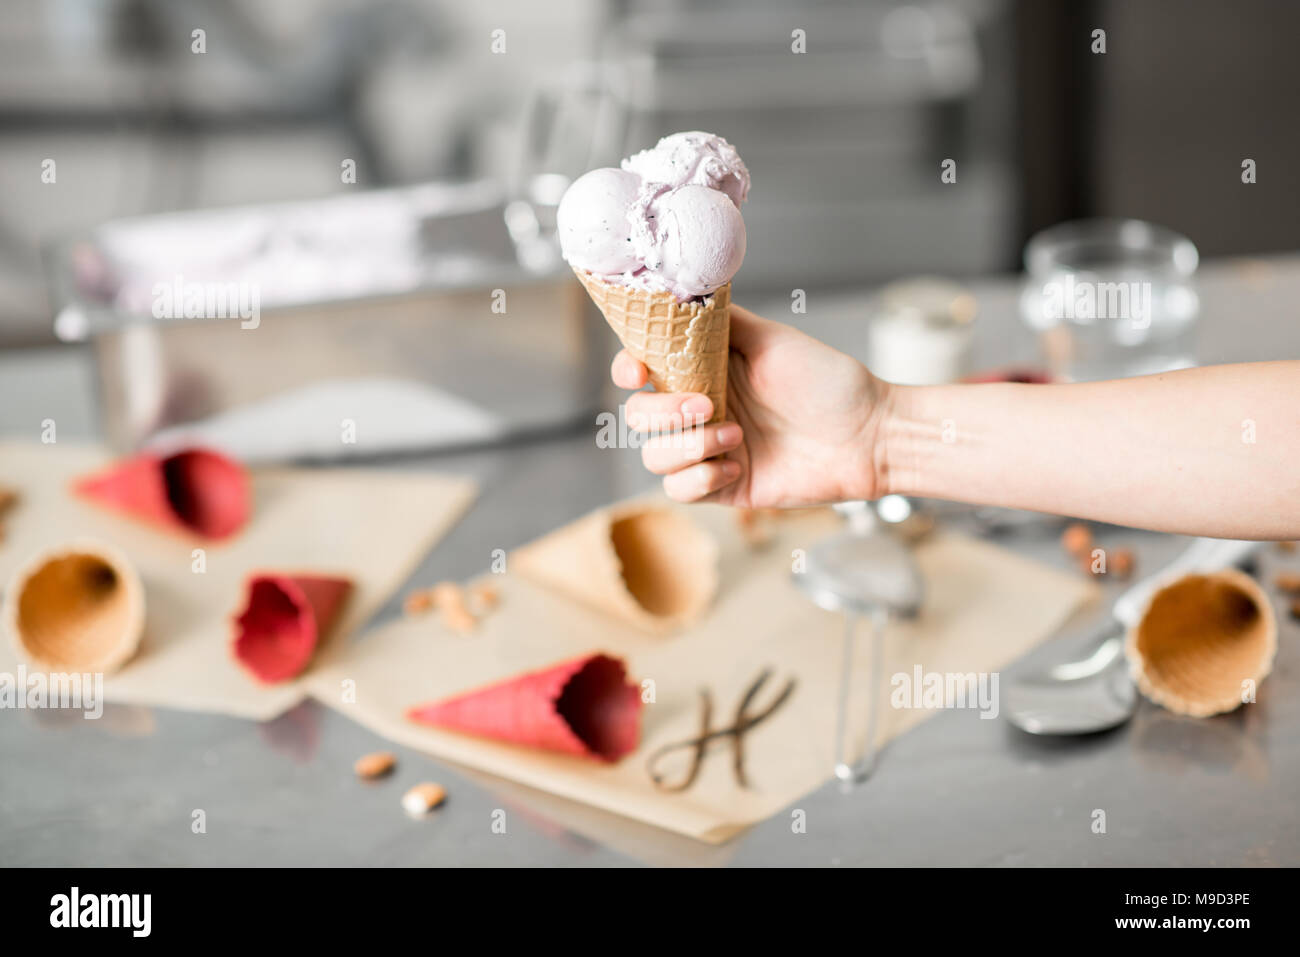 Holding waffle cone with ice cream indoors Stock Photo